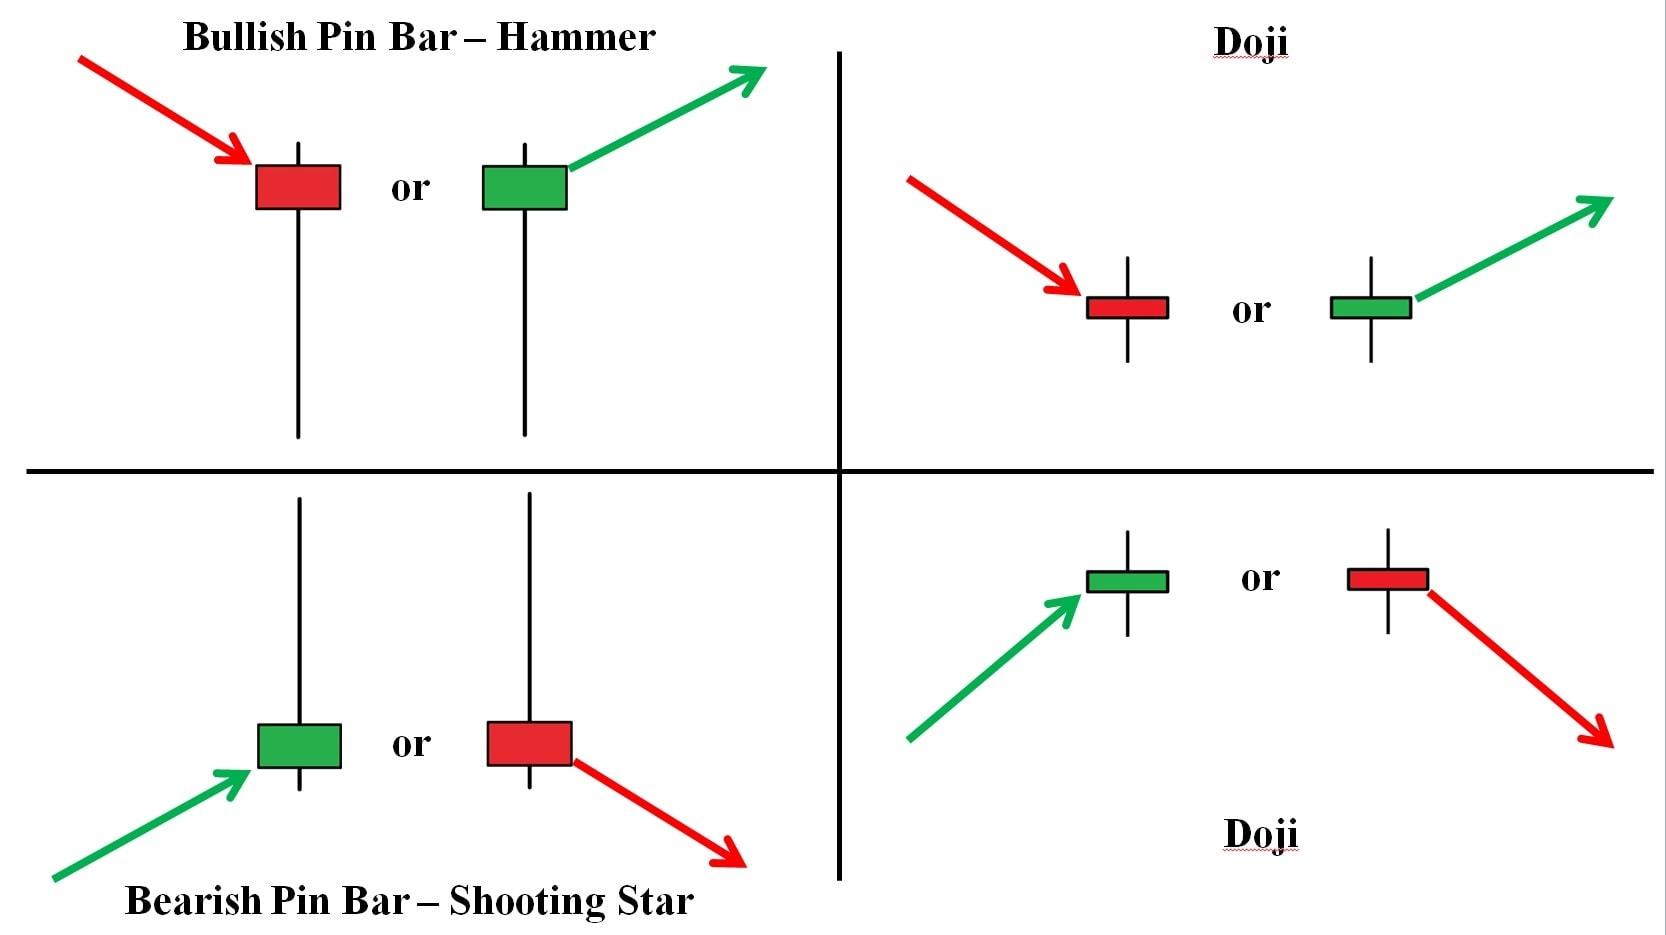 Doji and Pin Bar candlestick patterns